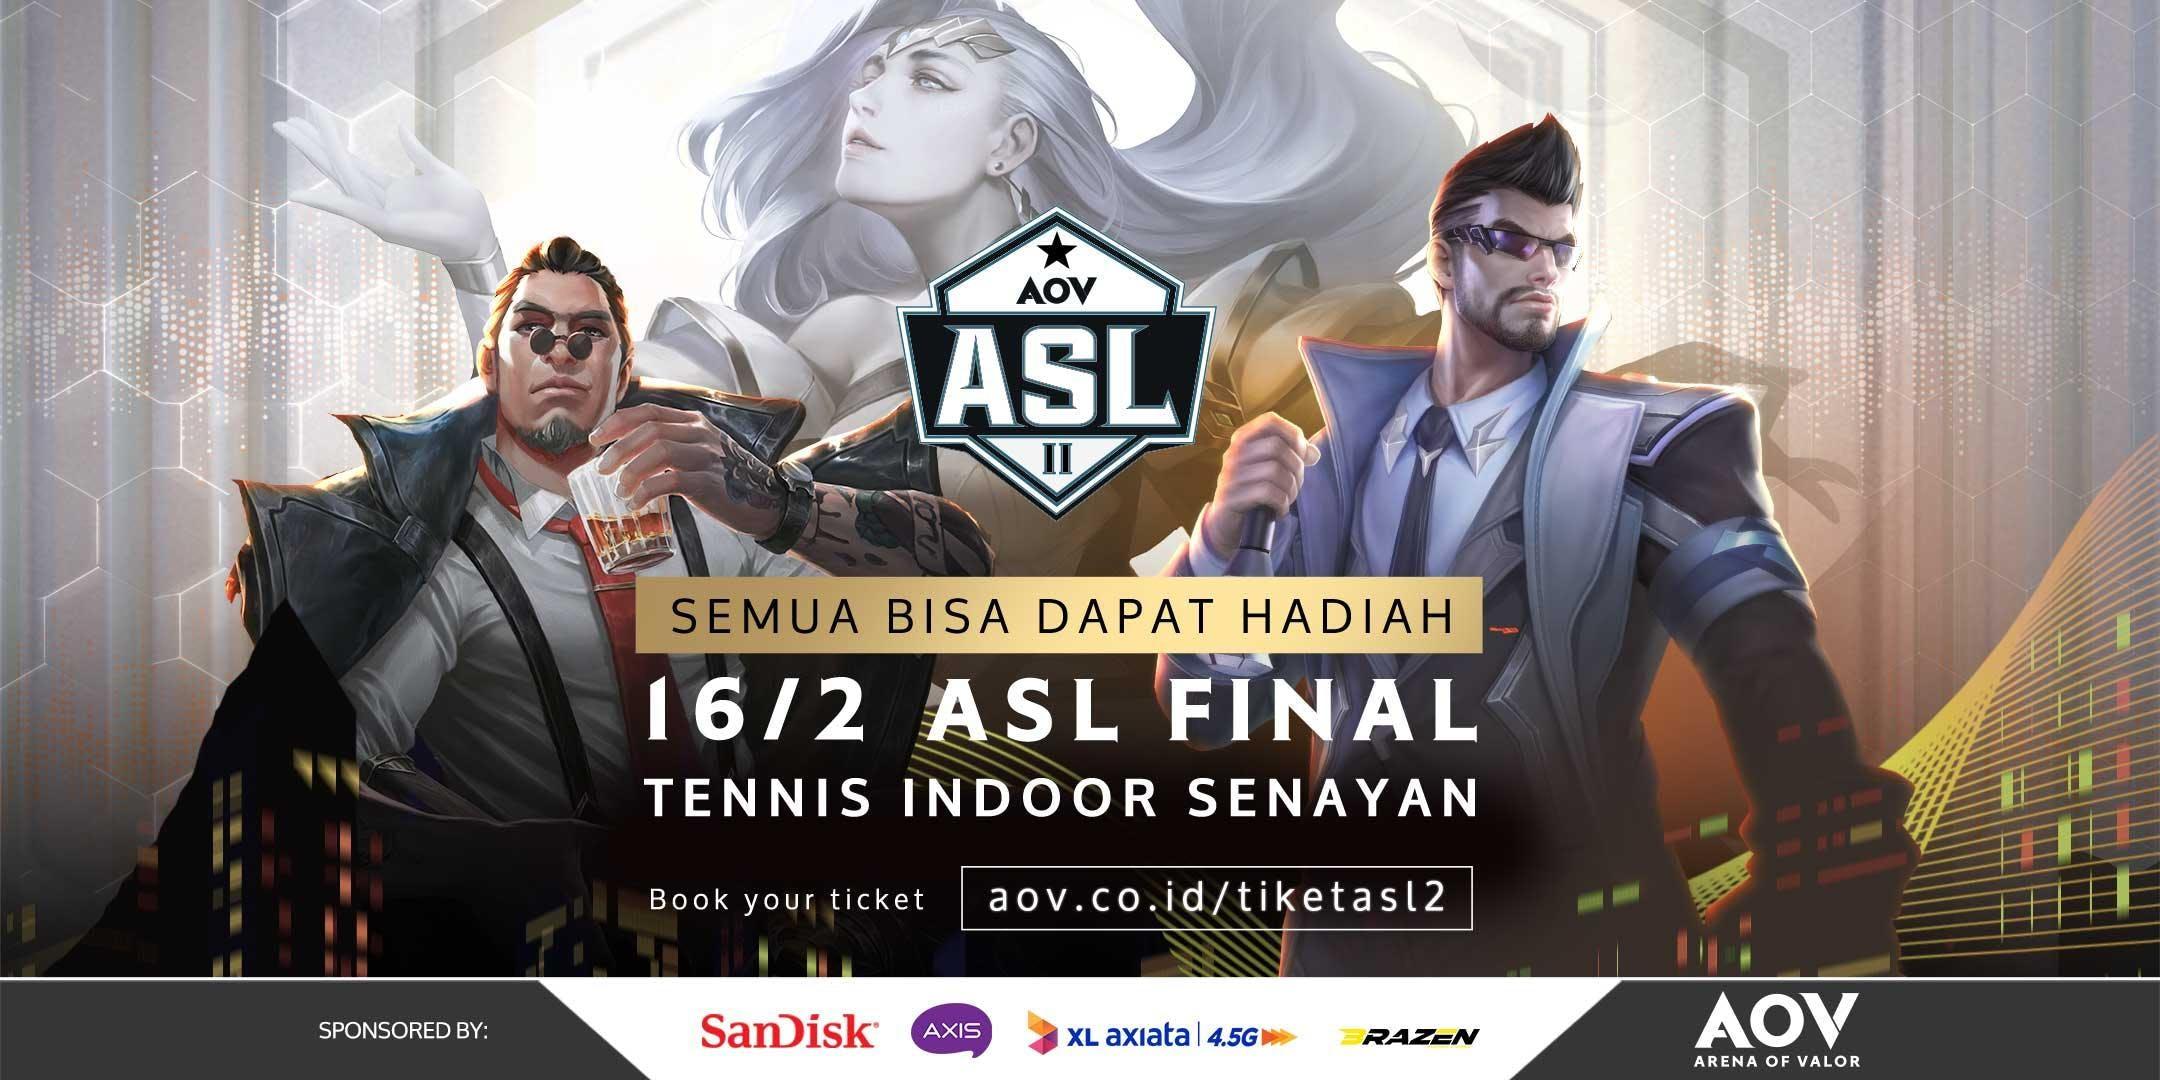 Grand Final AOV Star League (ASL) Season II